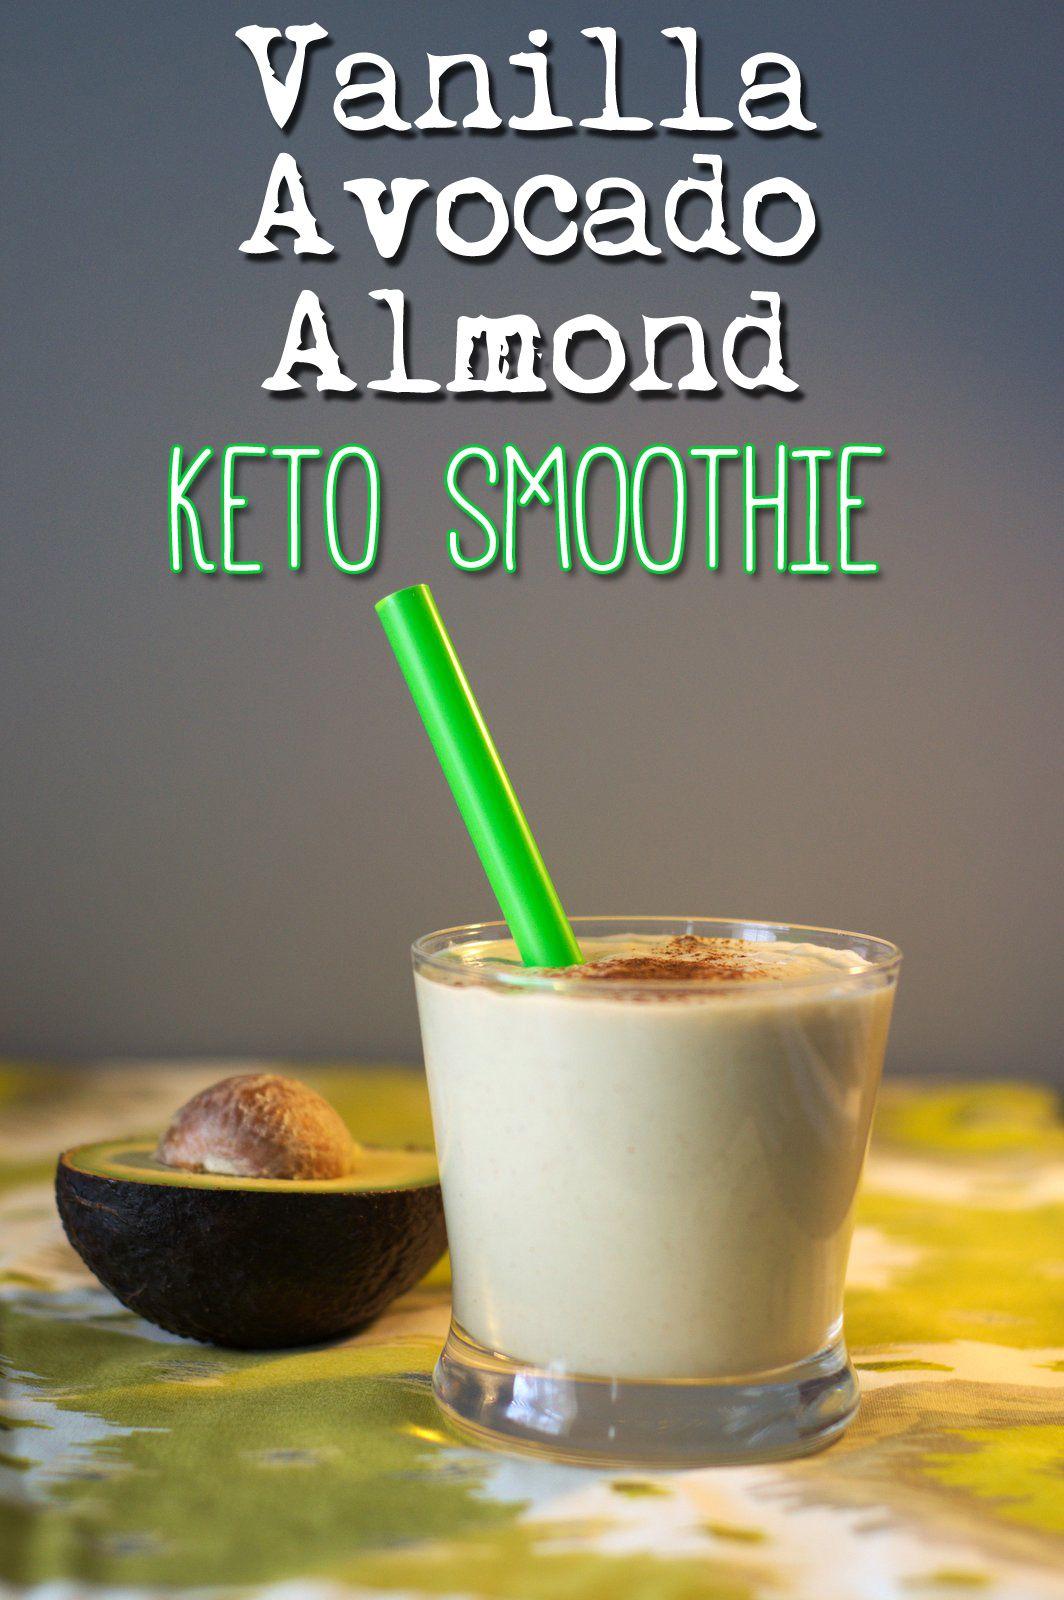 Low Carb Keto Vanilla Avocado Almond Smoothie   Low carb